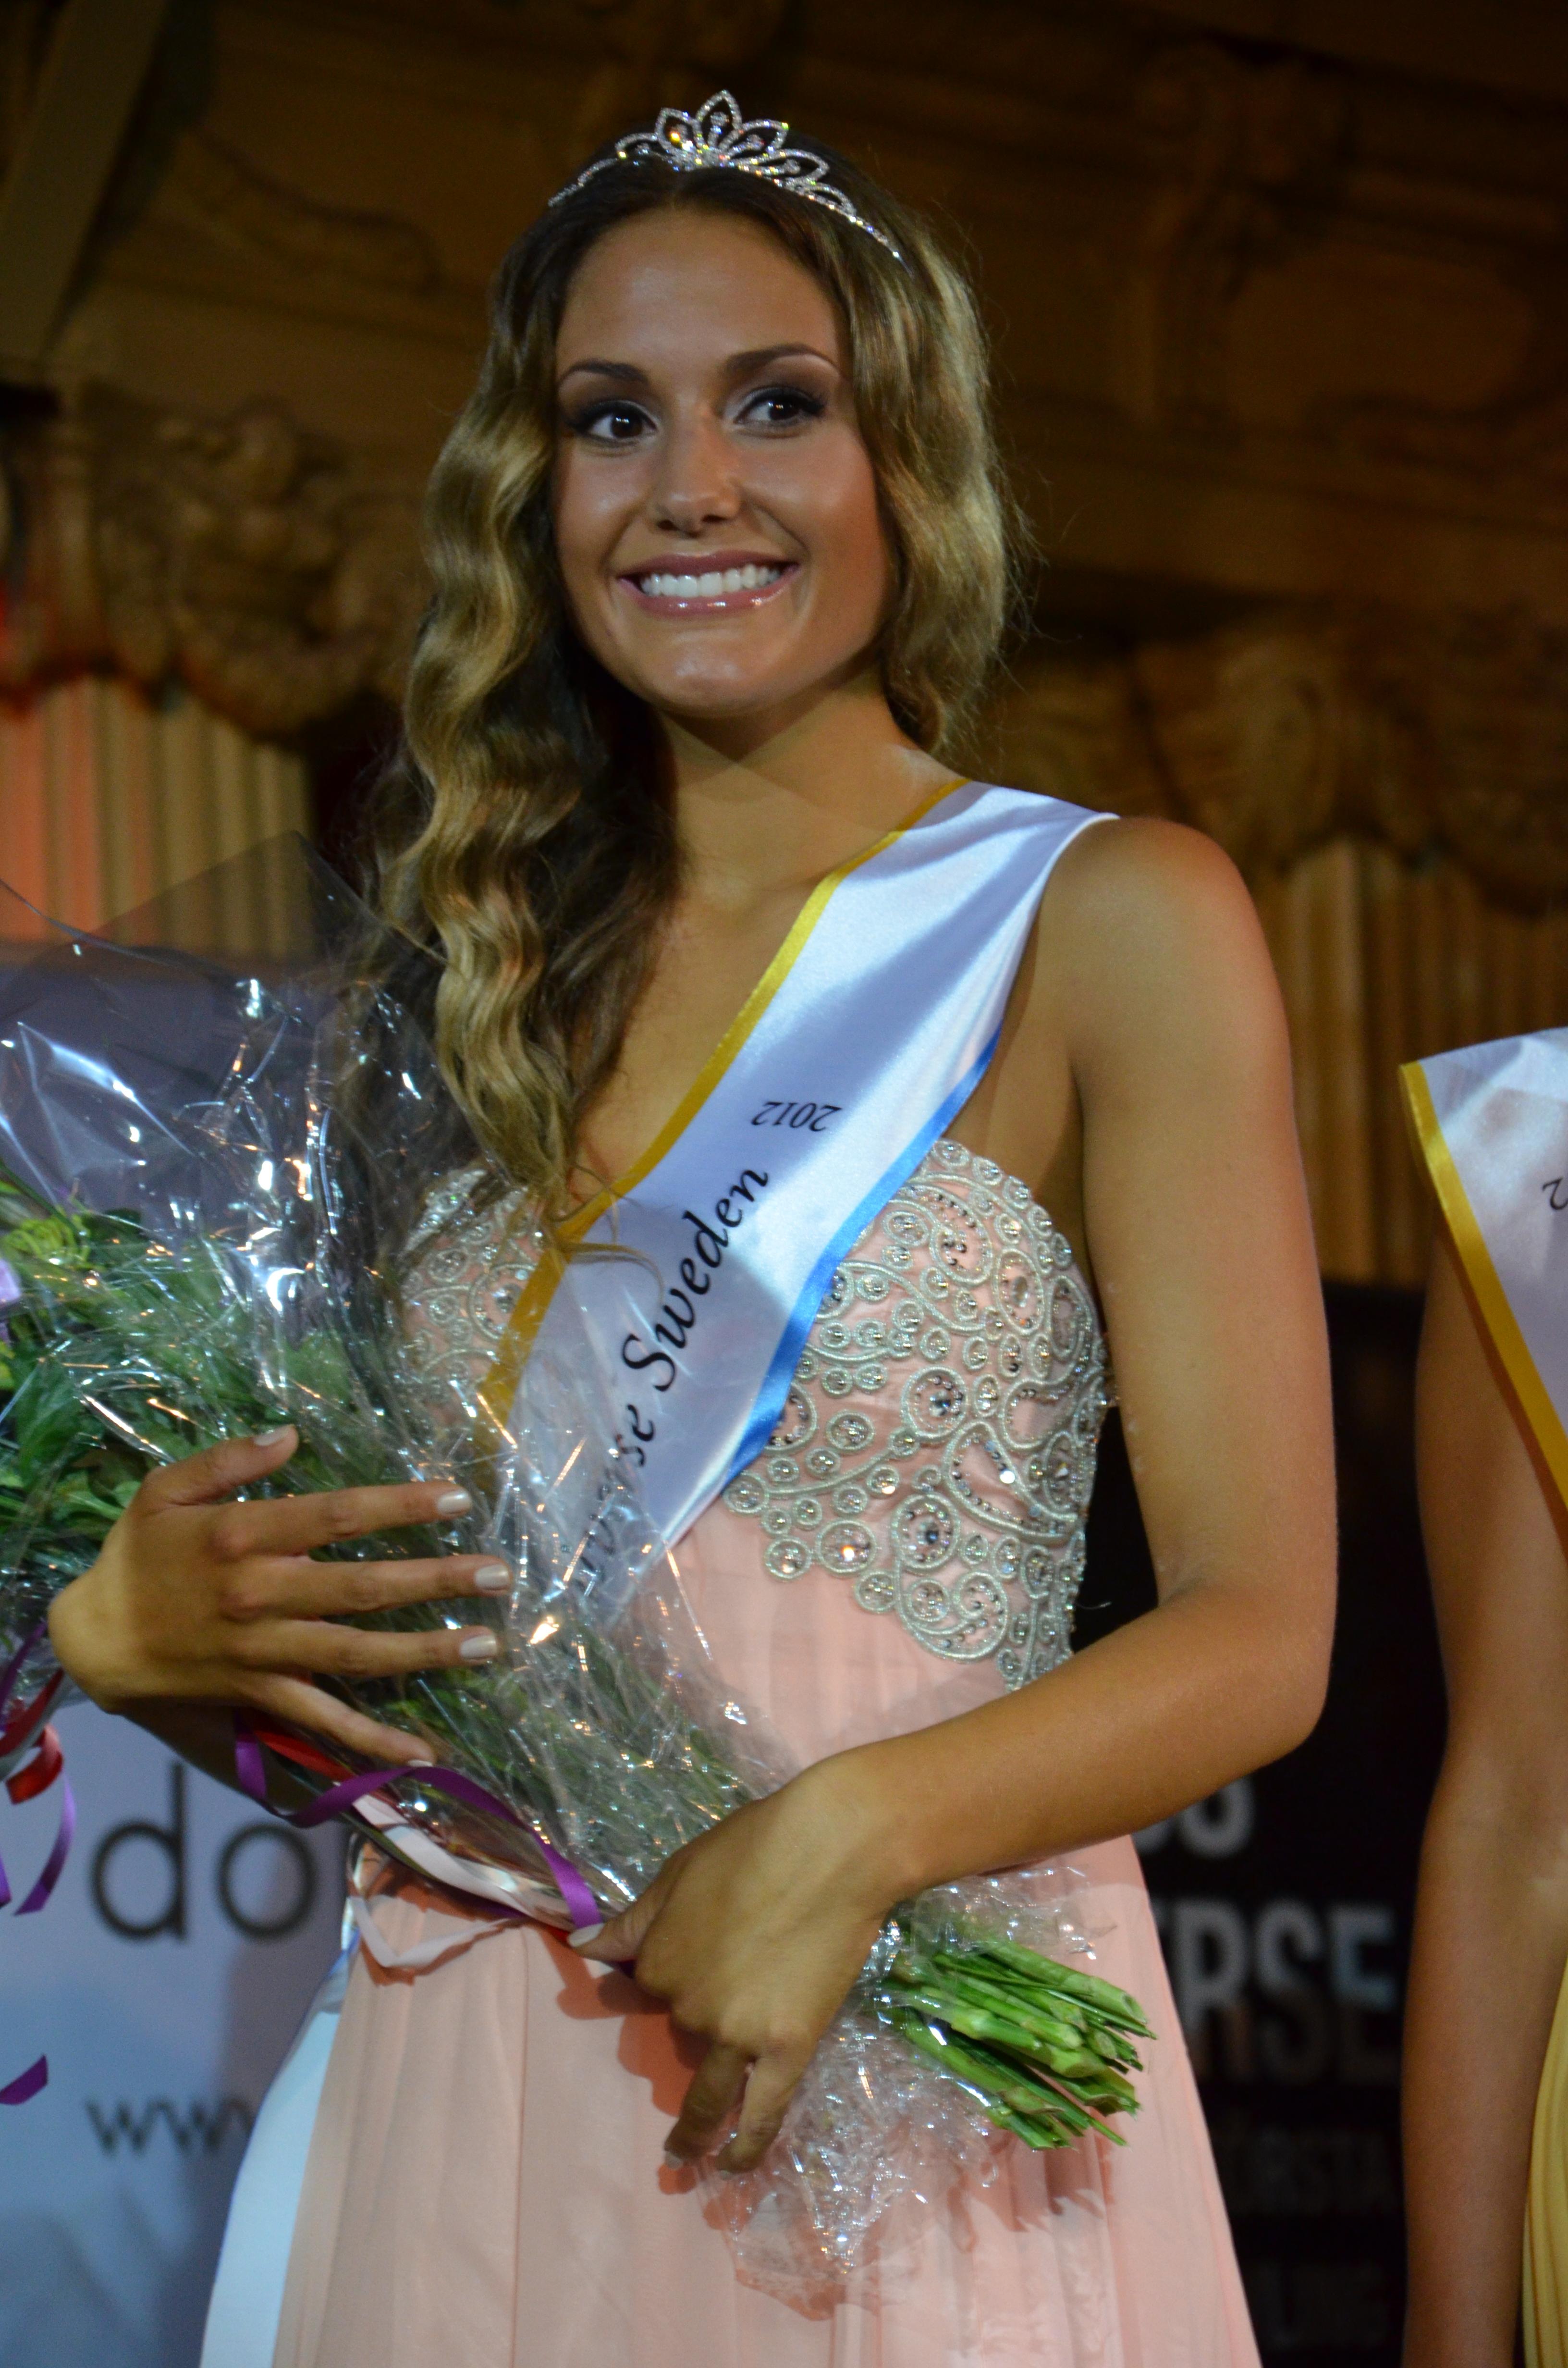 Miss silvesterlauf 2012 fotos